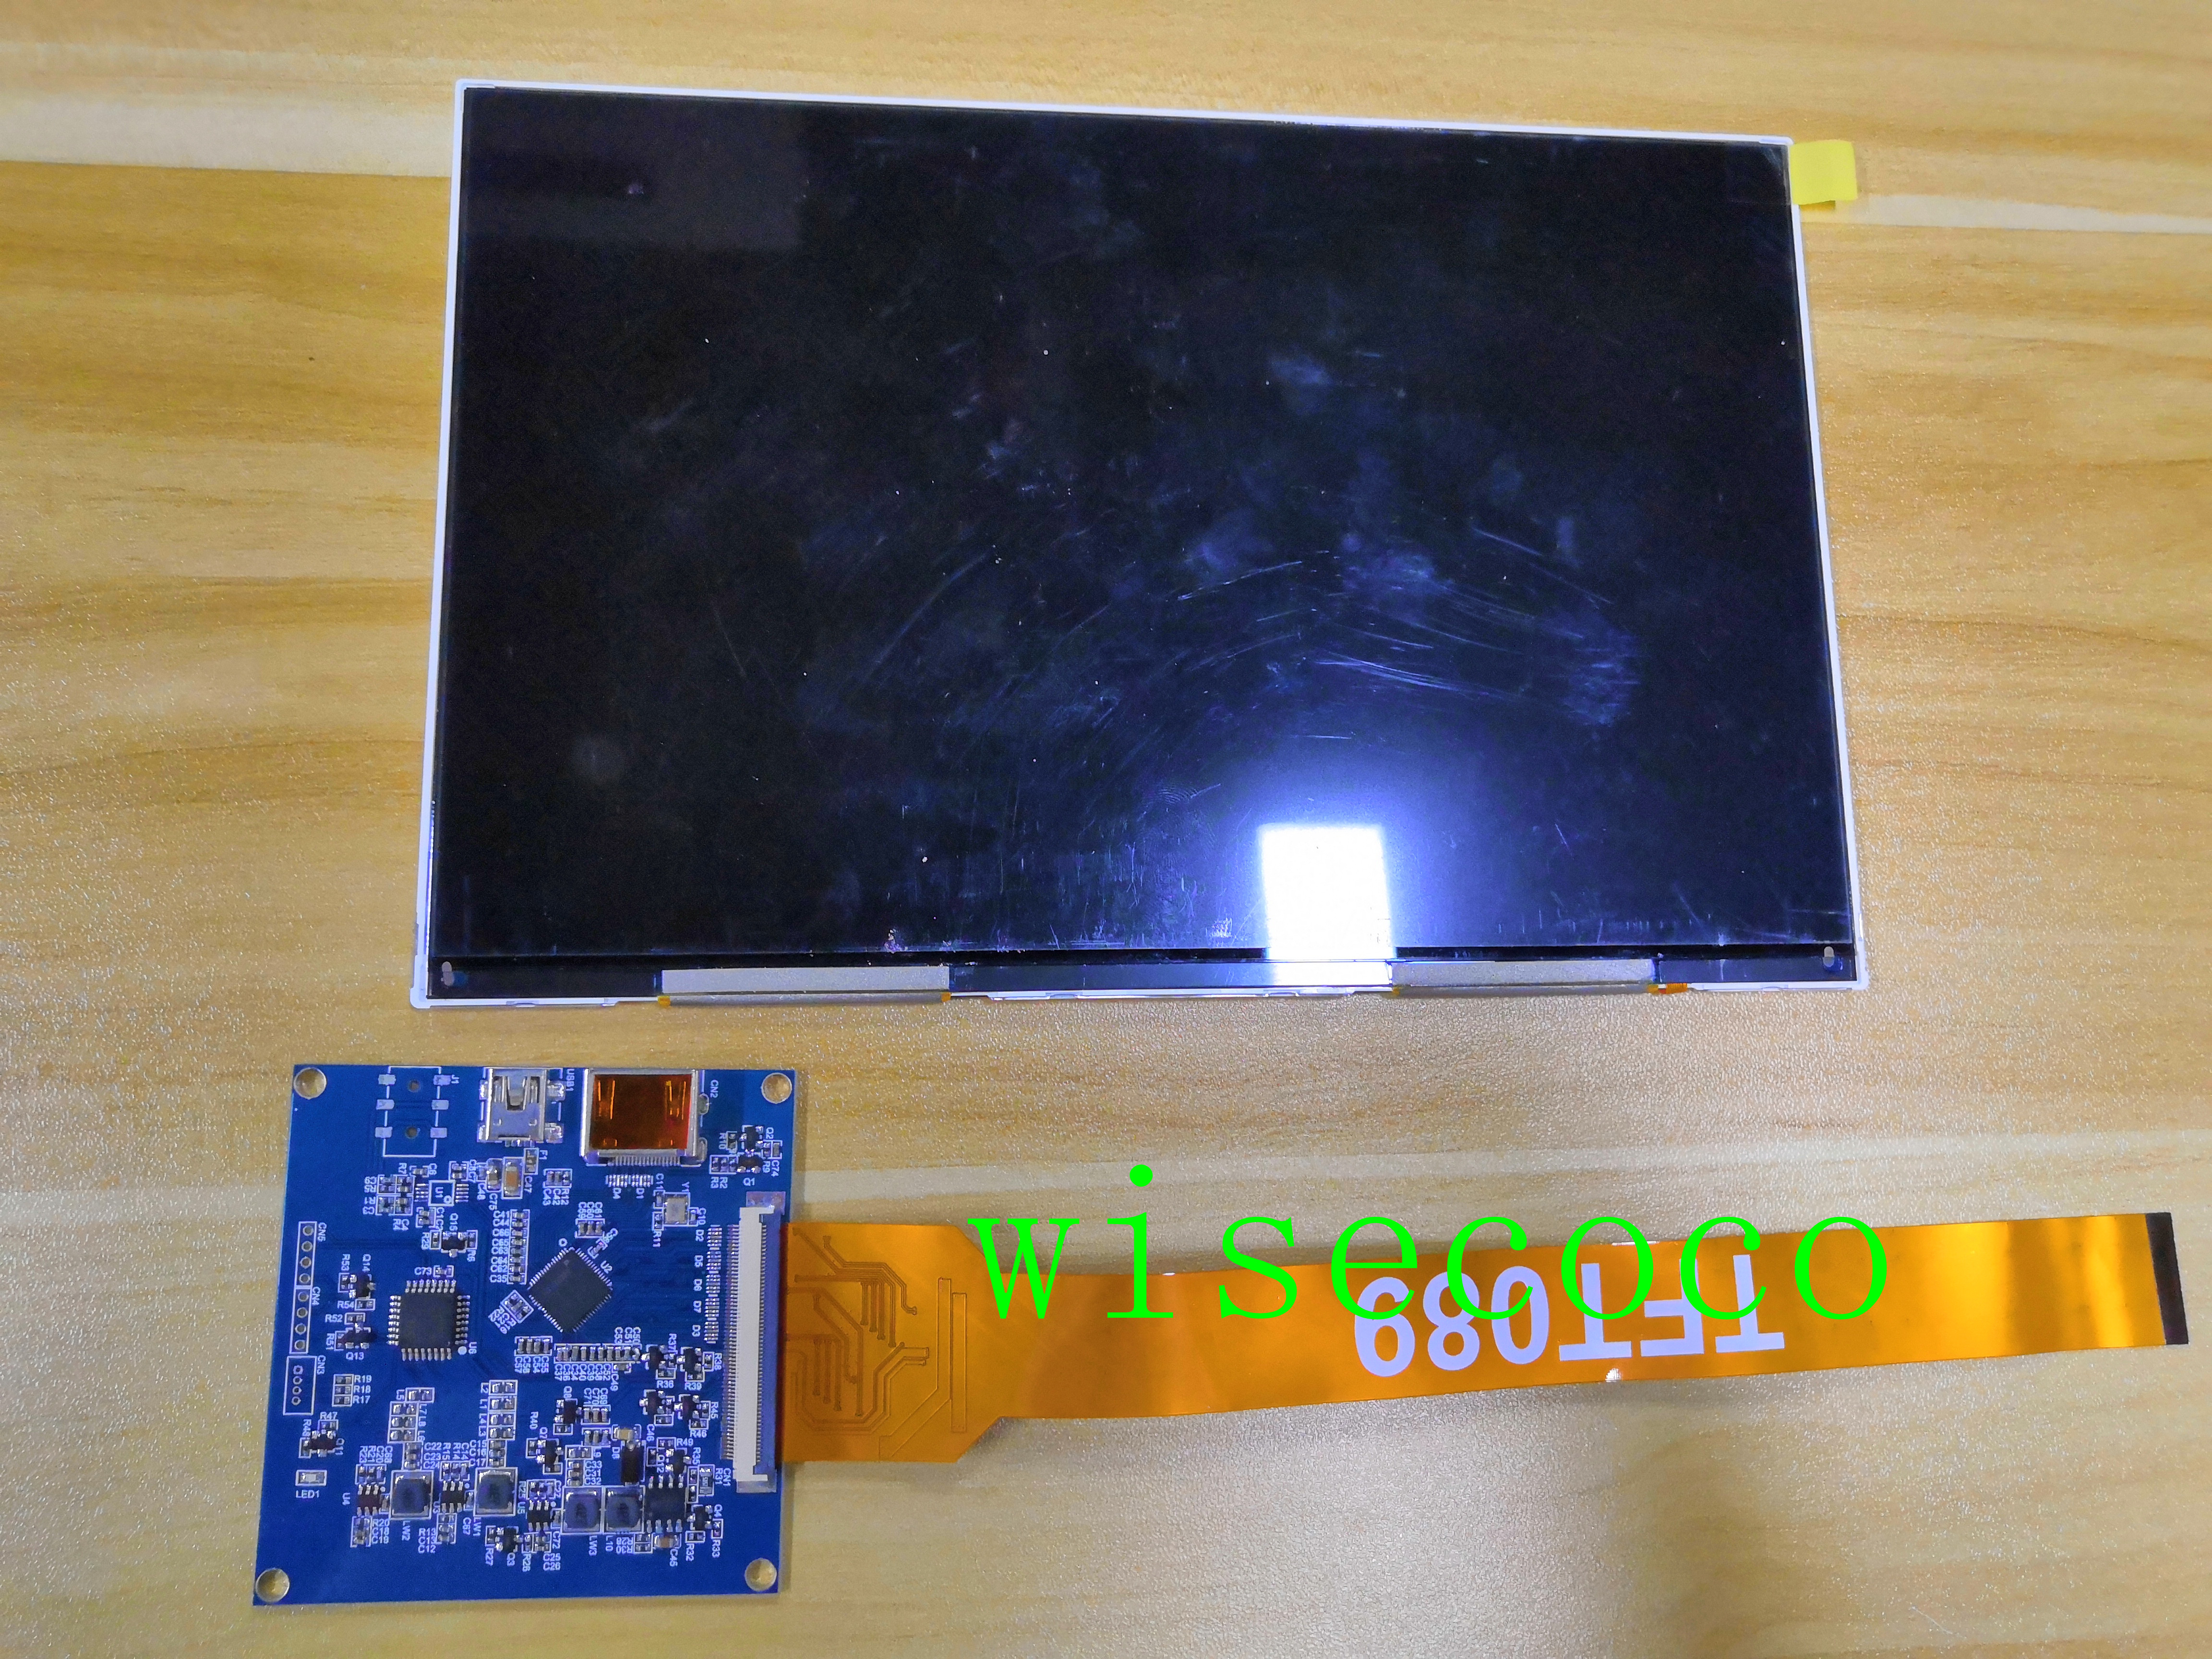 8.9 Inch 2560*1600 2k  IPS Lcd Display 16:10 Screen With HDMI MIPI Driver Board Raspberry PI 3 DIY DLP 3d Printer